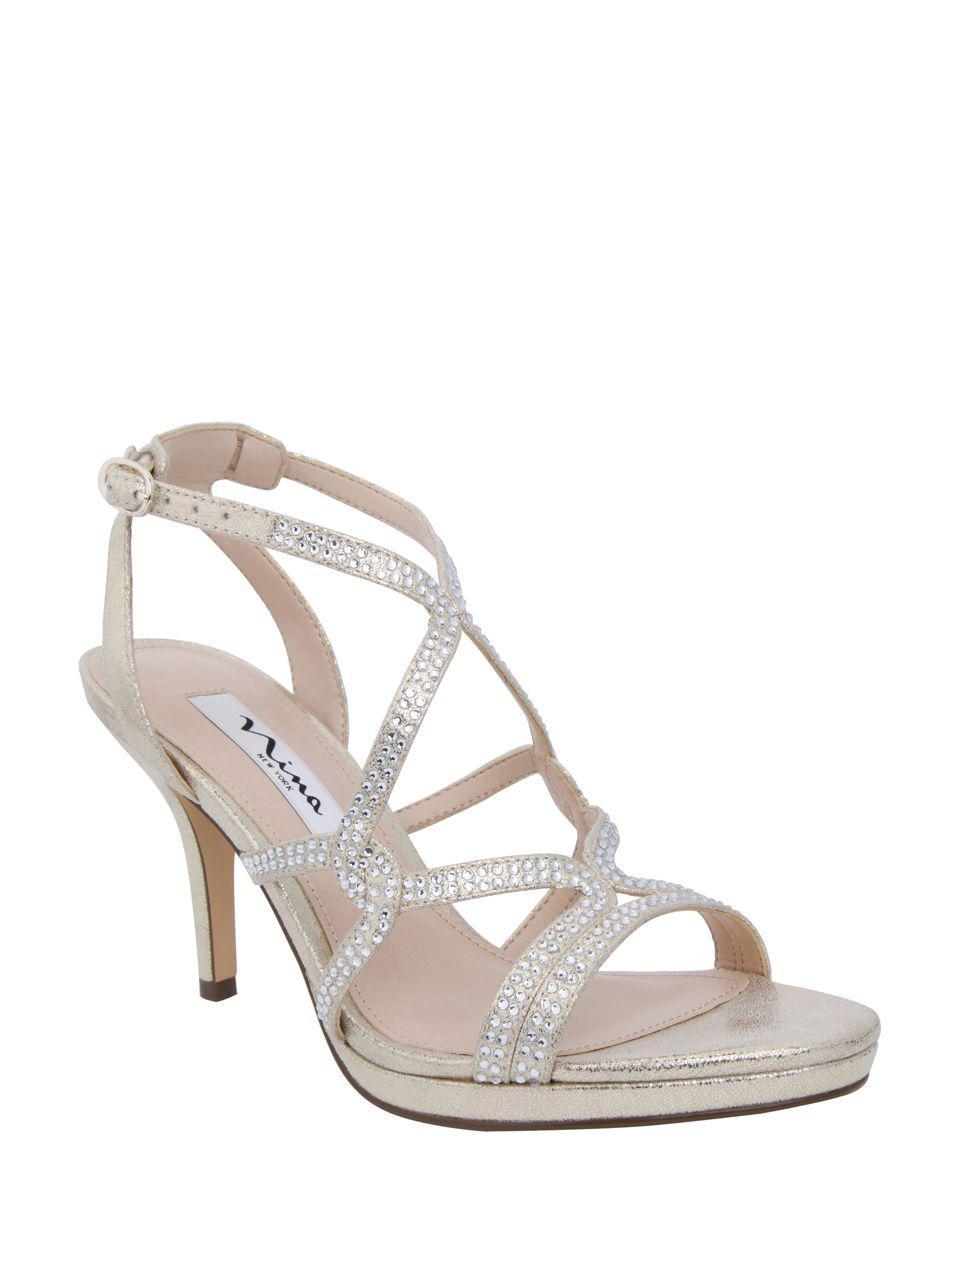 1f227311cd7 Lyst - Nina Varsha Metallic Sandals in Metallic